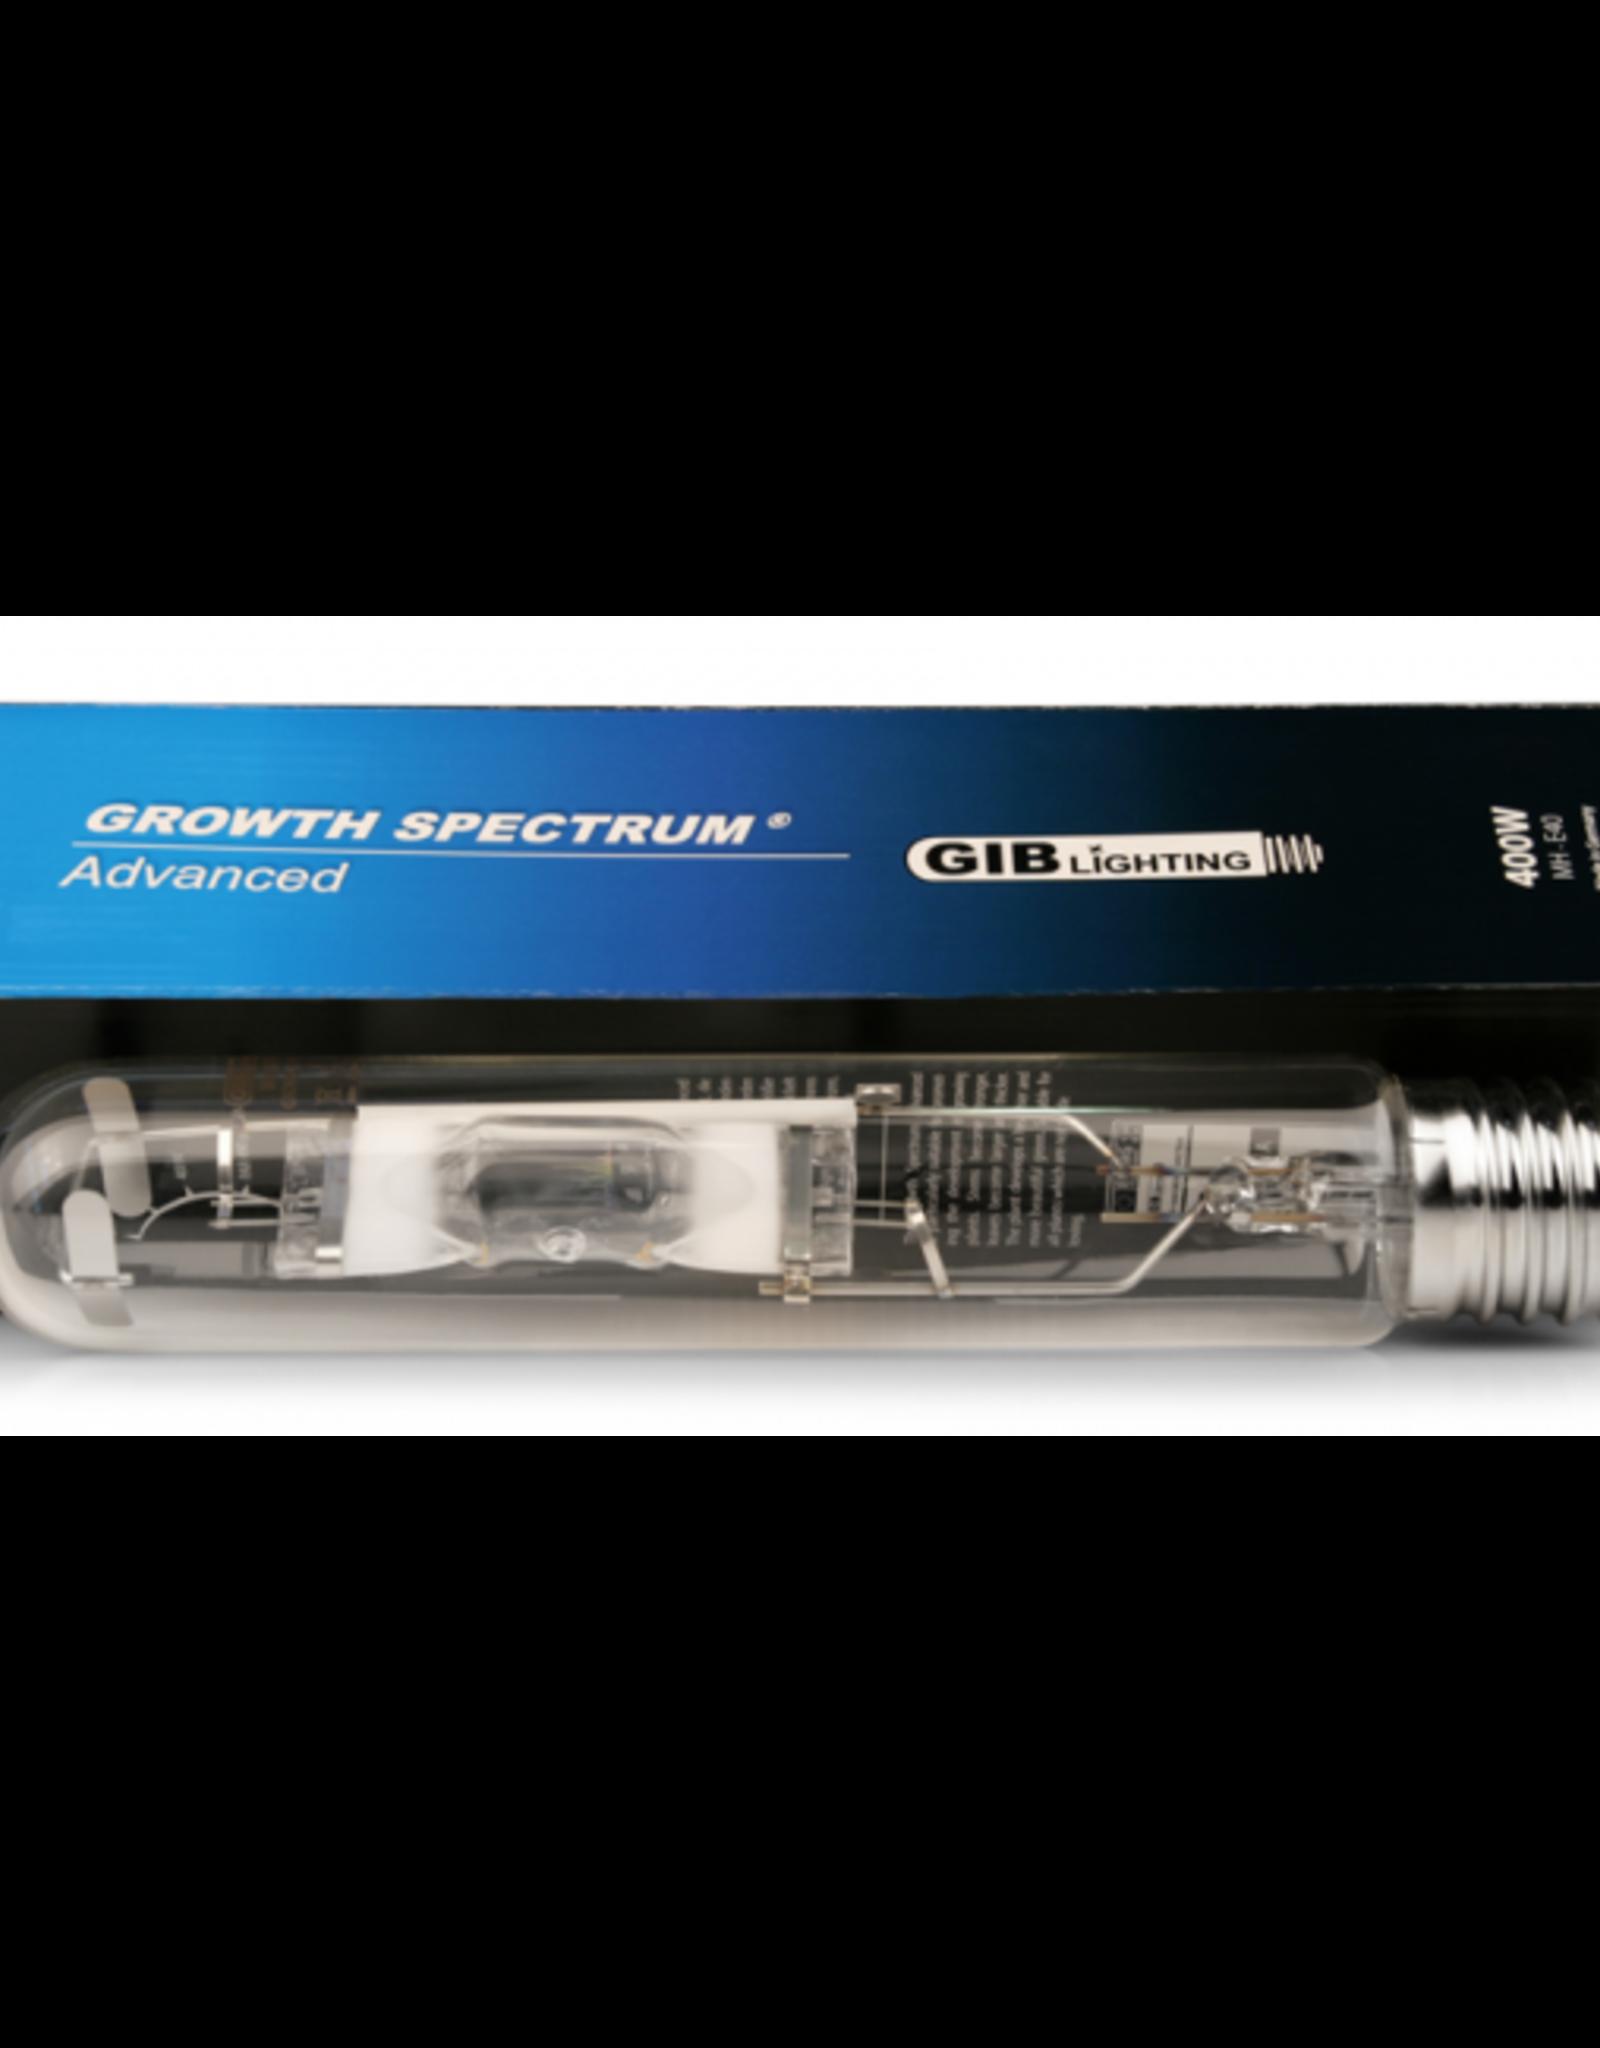 GIB GIB Lighting Growth Spectrum Advanced 400W MH